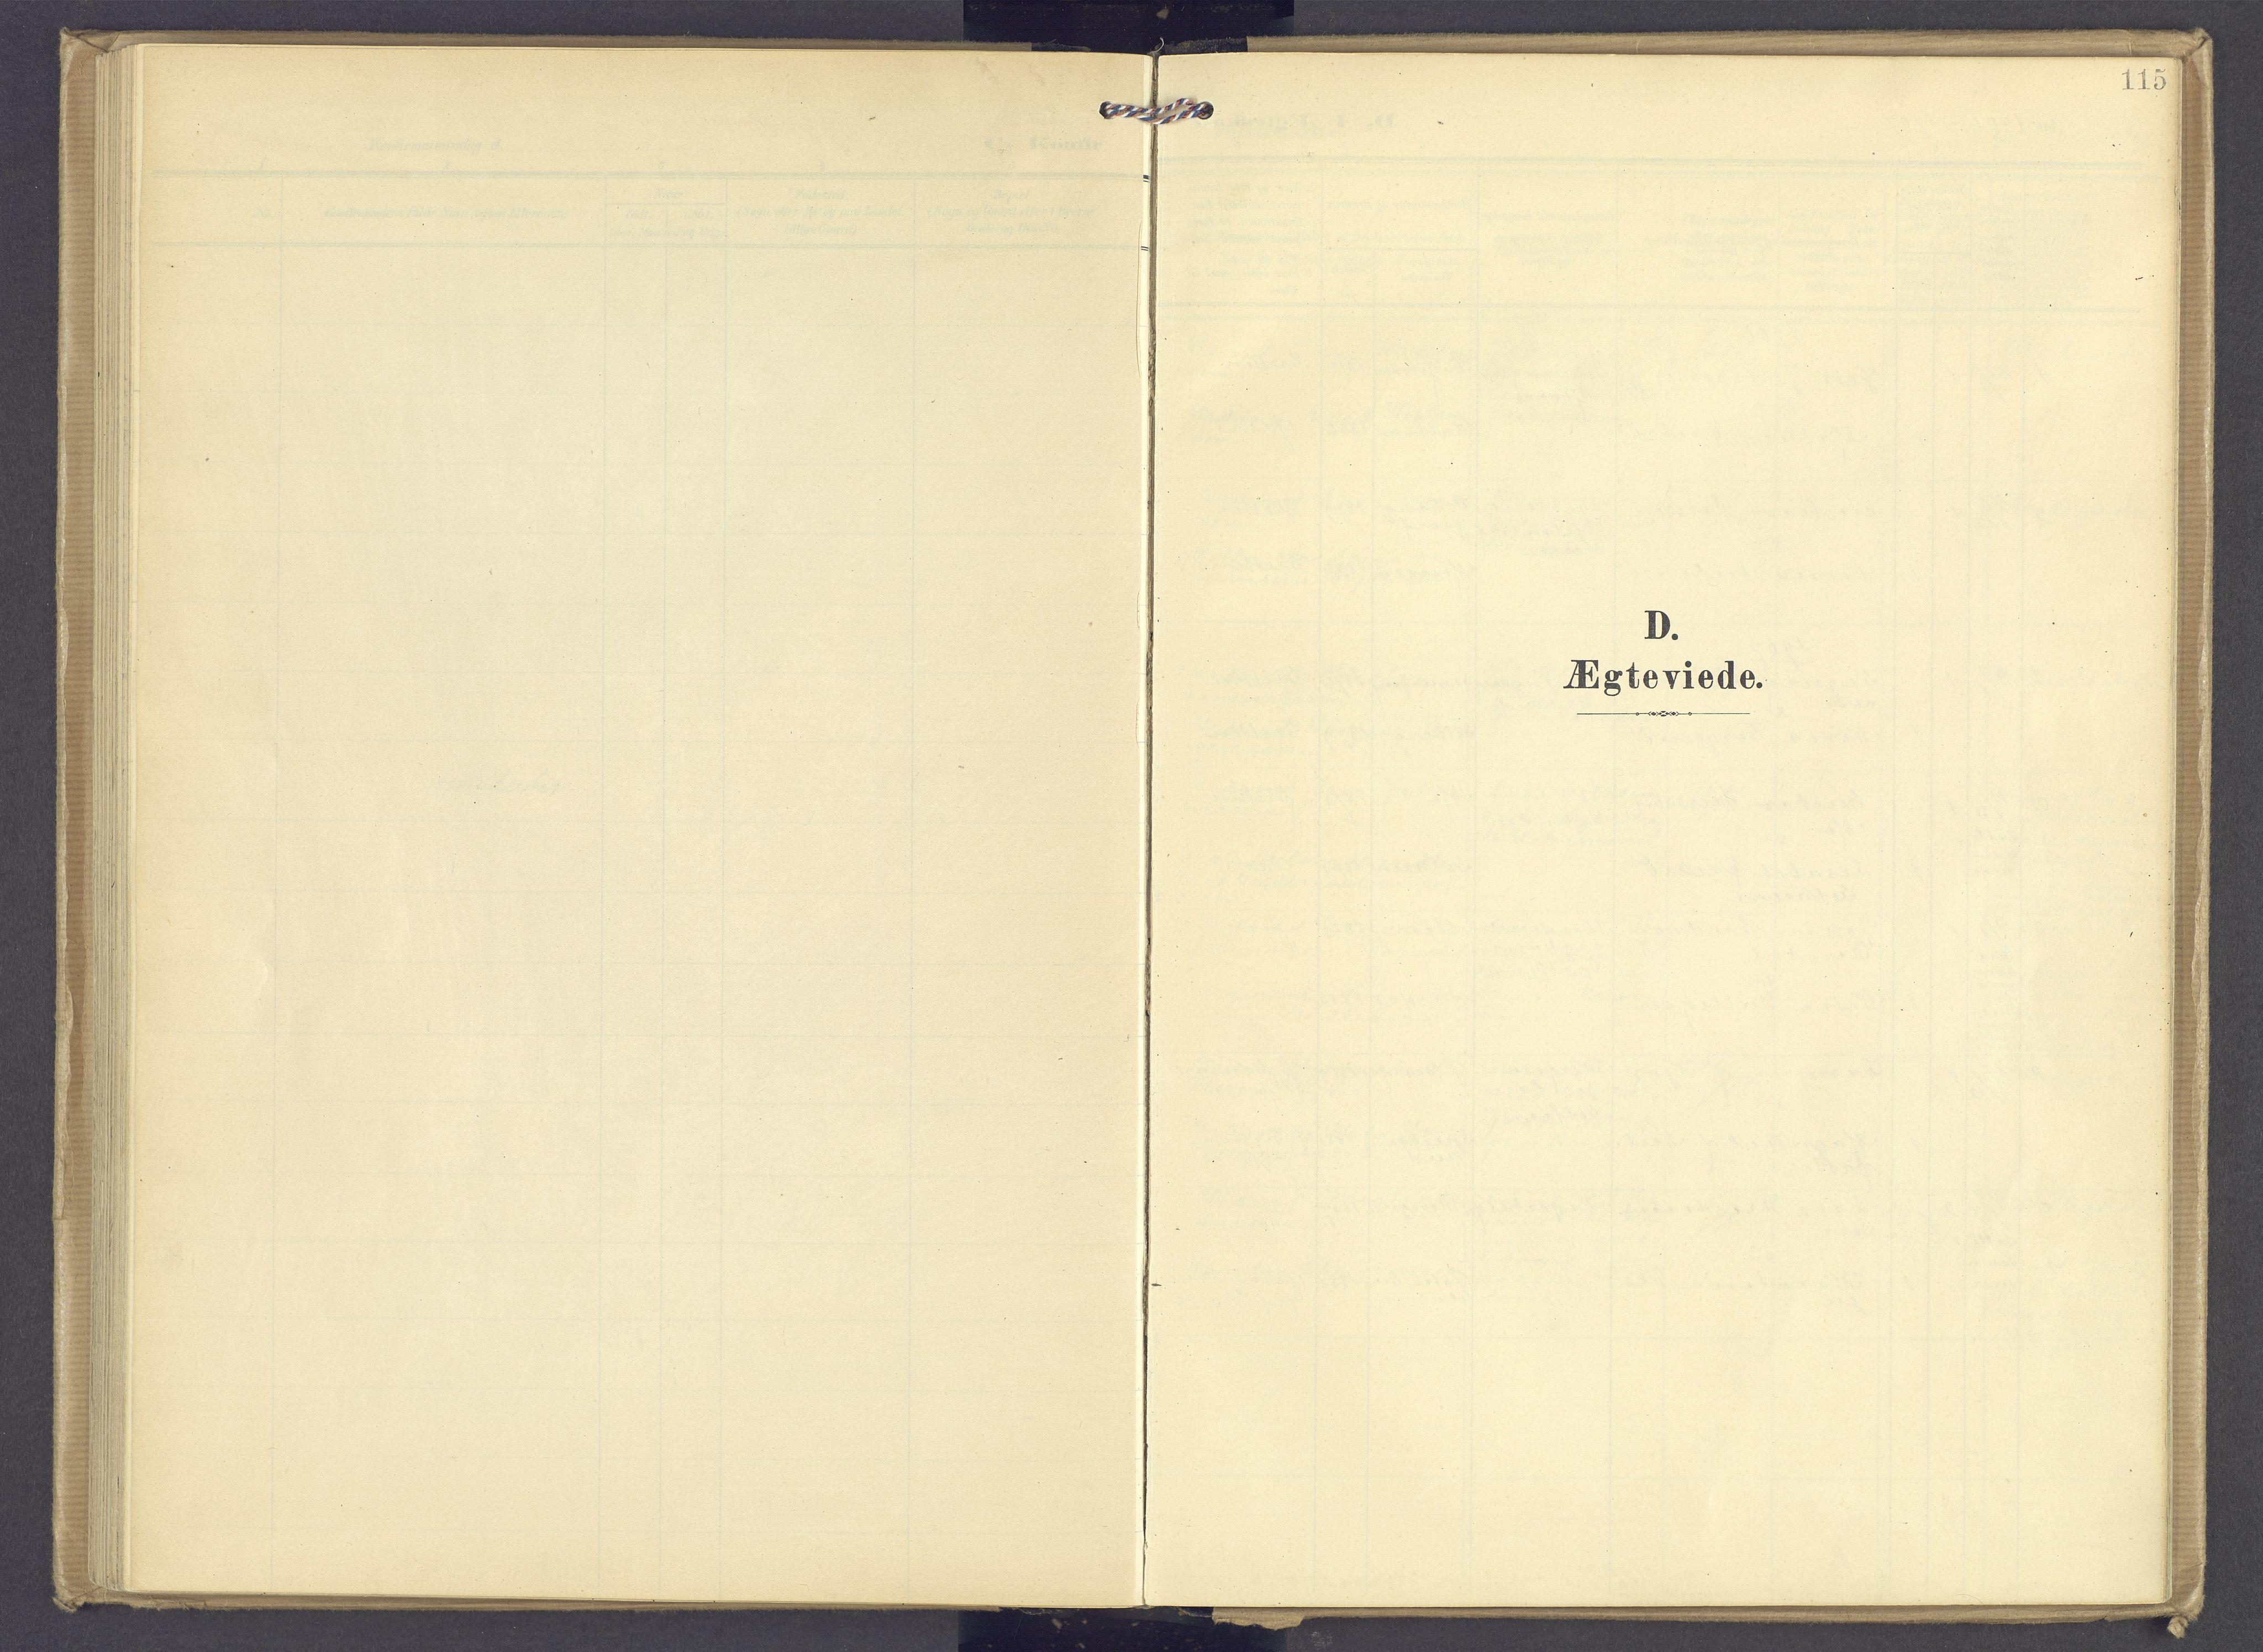 SAH, Øyer prestekontor, Ministerialbok nr. 13, 1905-1920, s. 115